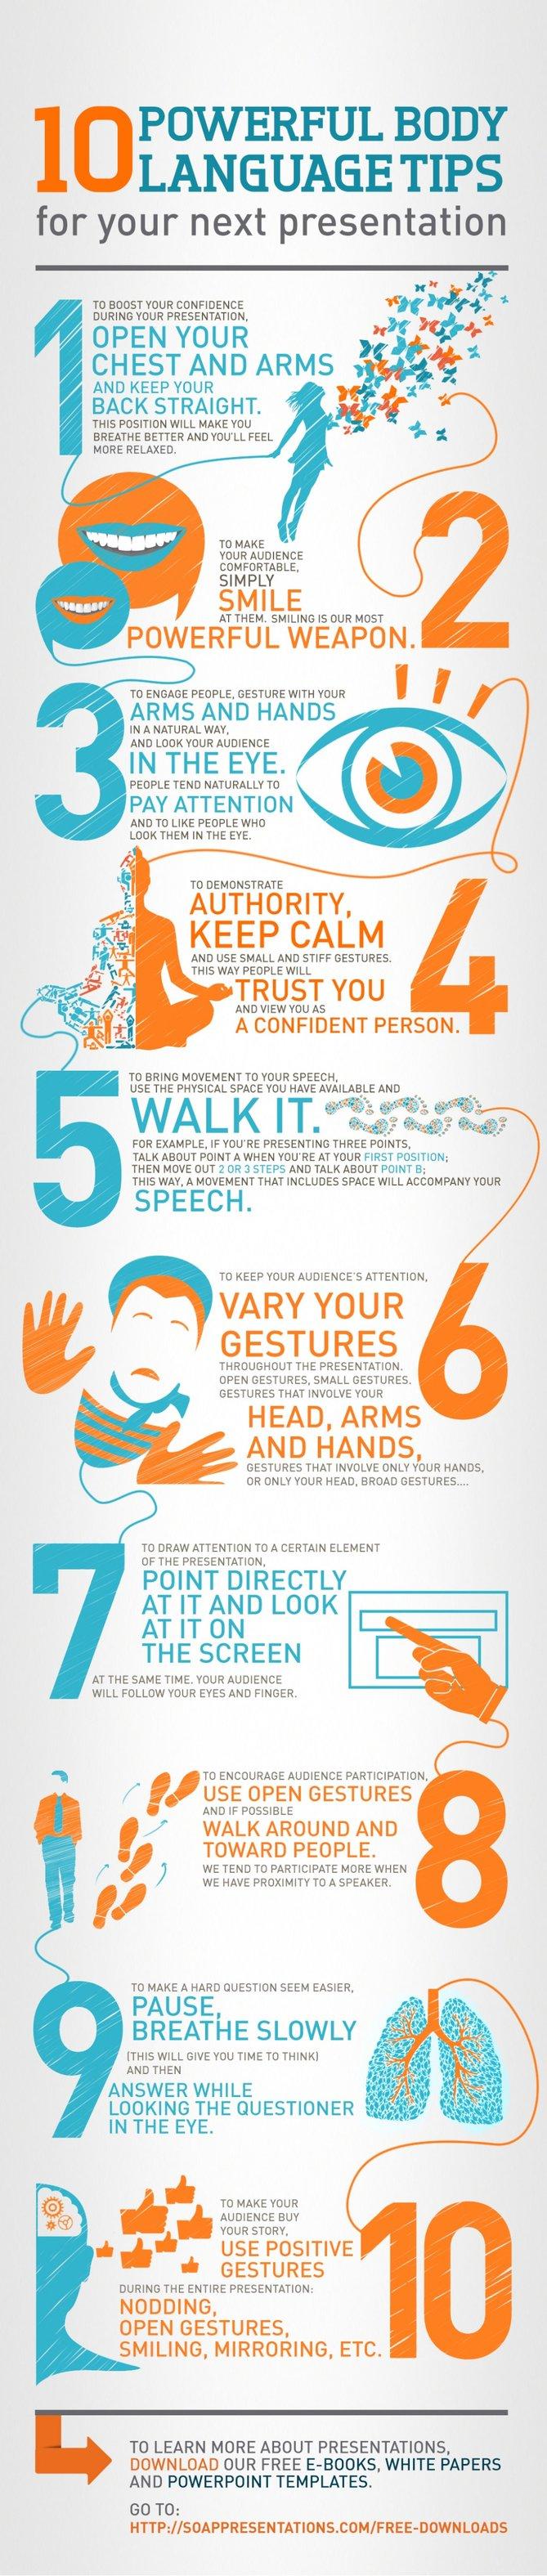 body-language-tips-infographic